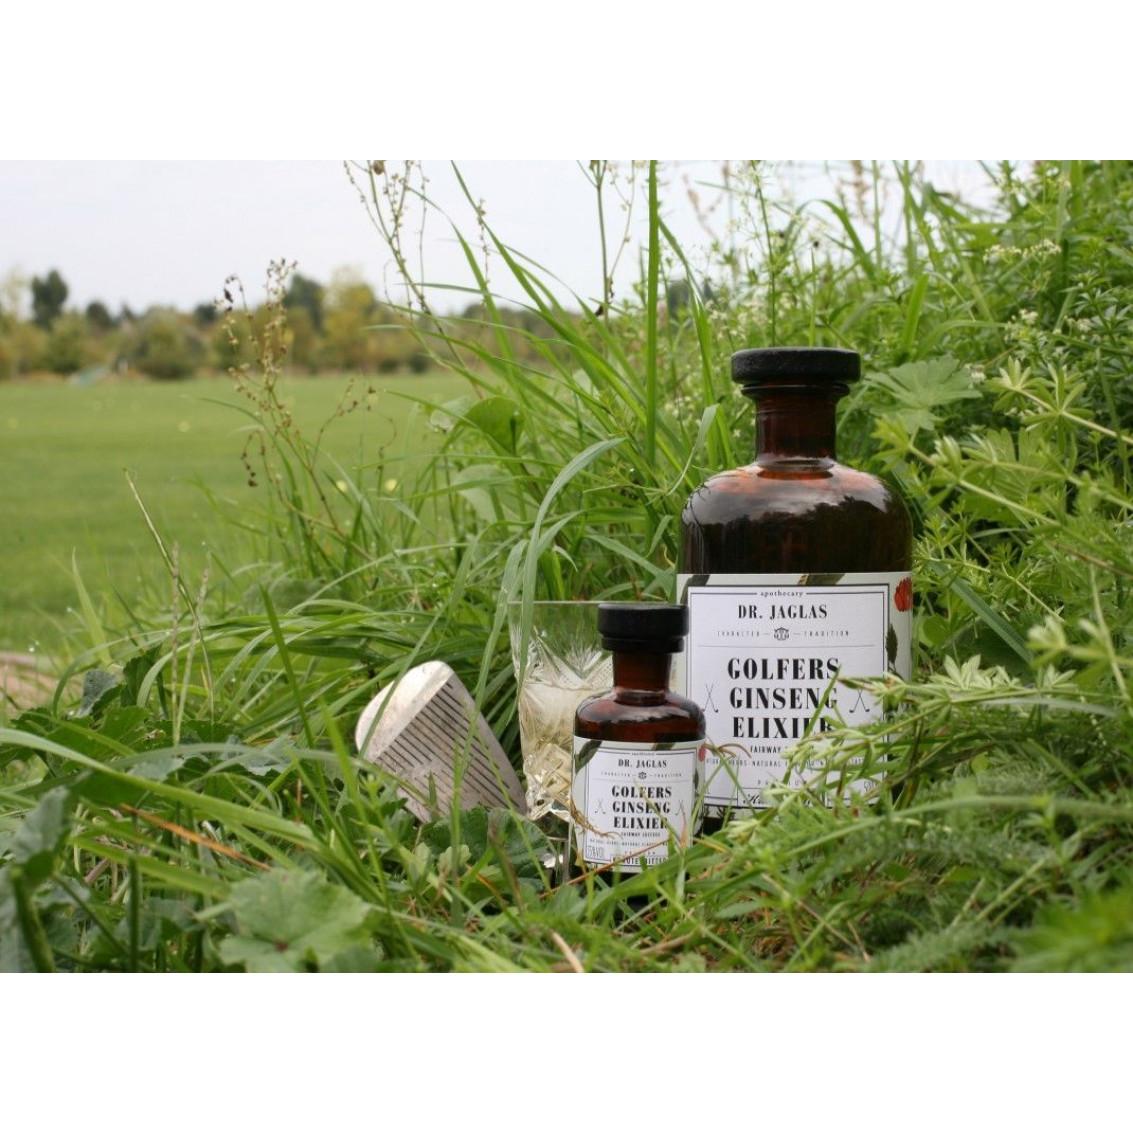 Golfers Ginseng-Elixier Set | 6 x 50 ml